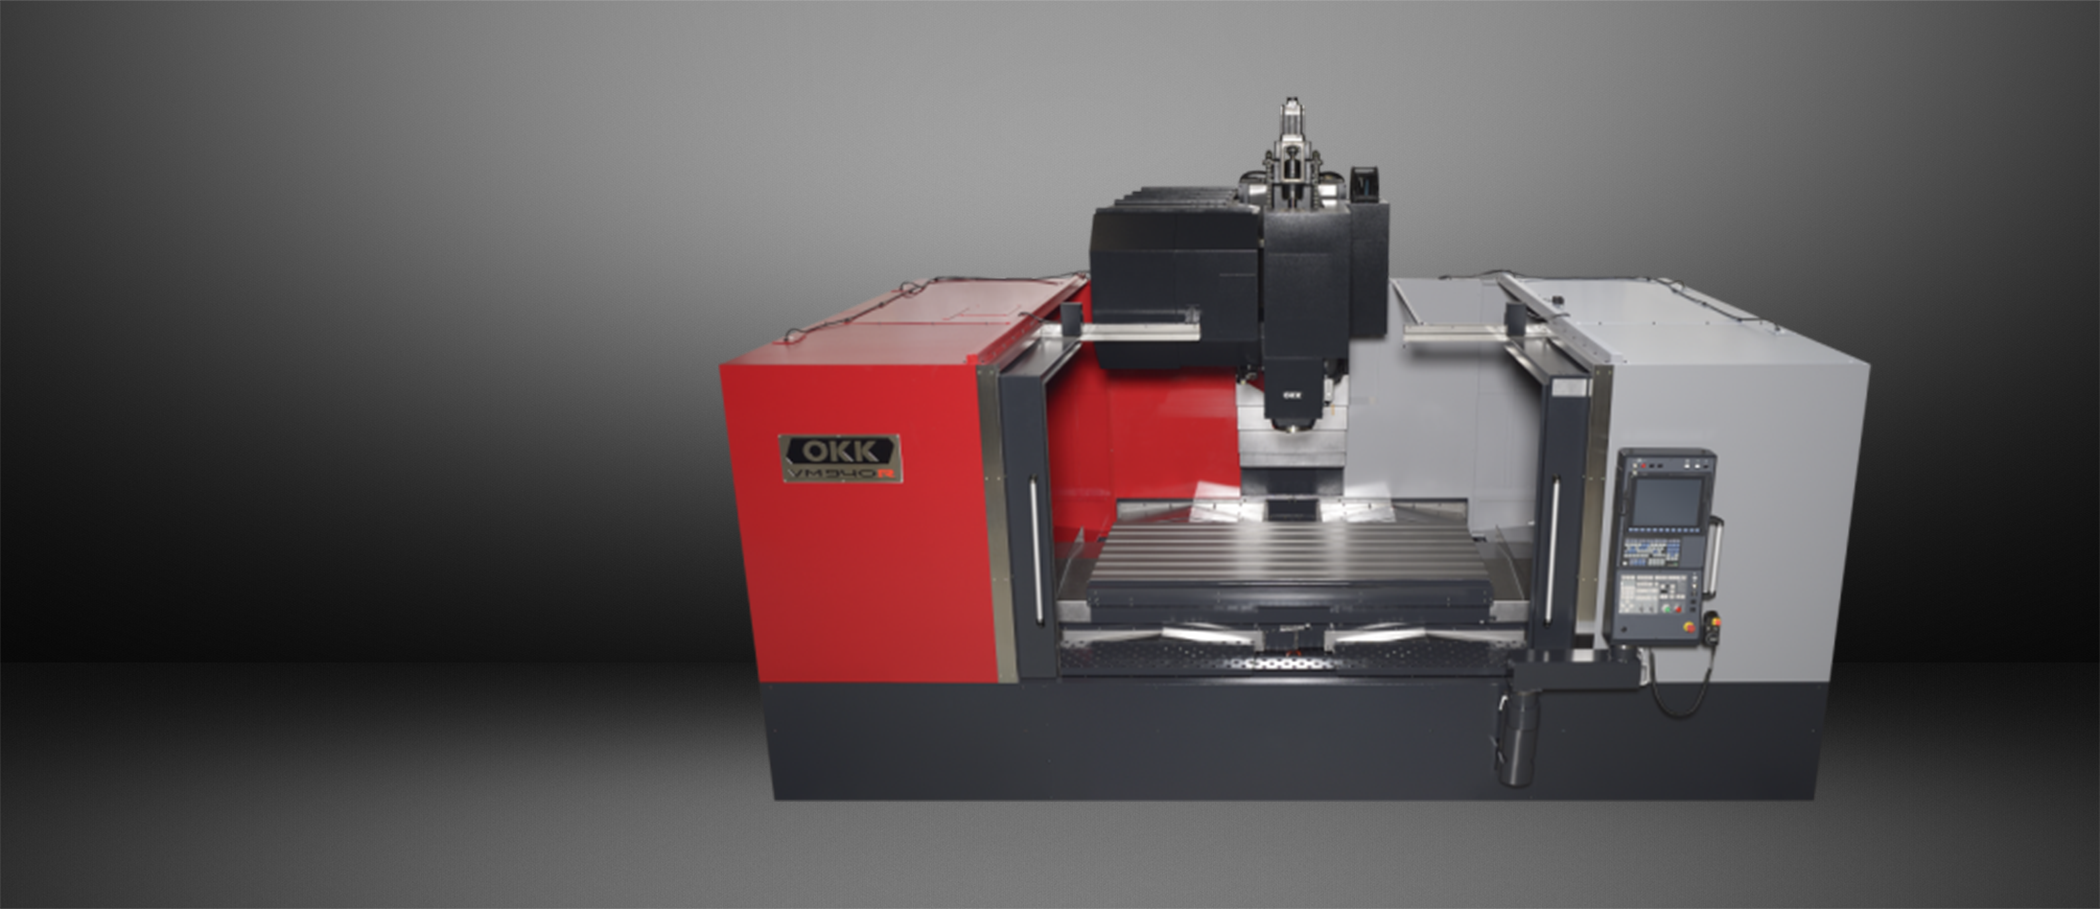 VM-940R Vertical Machining Centers